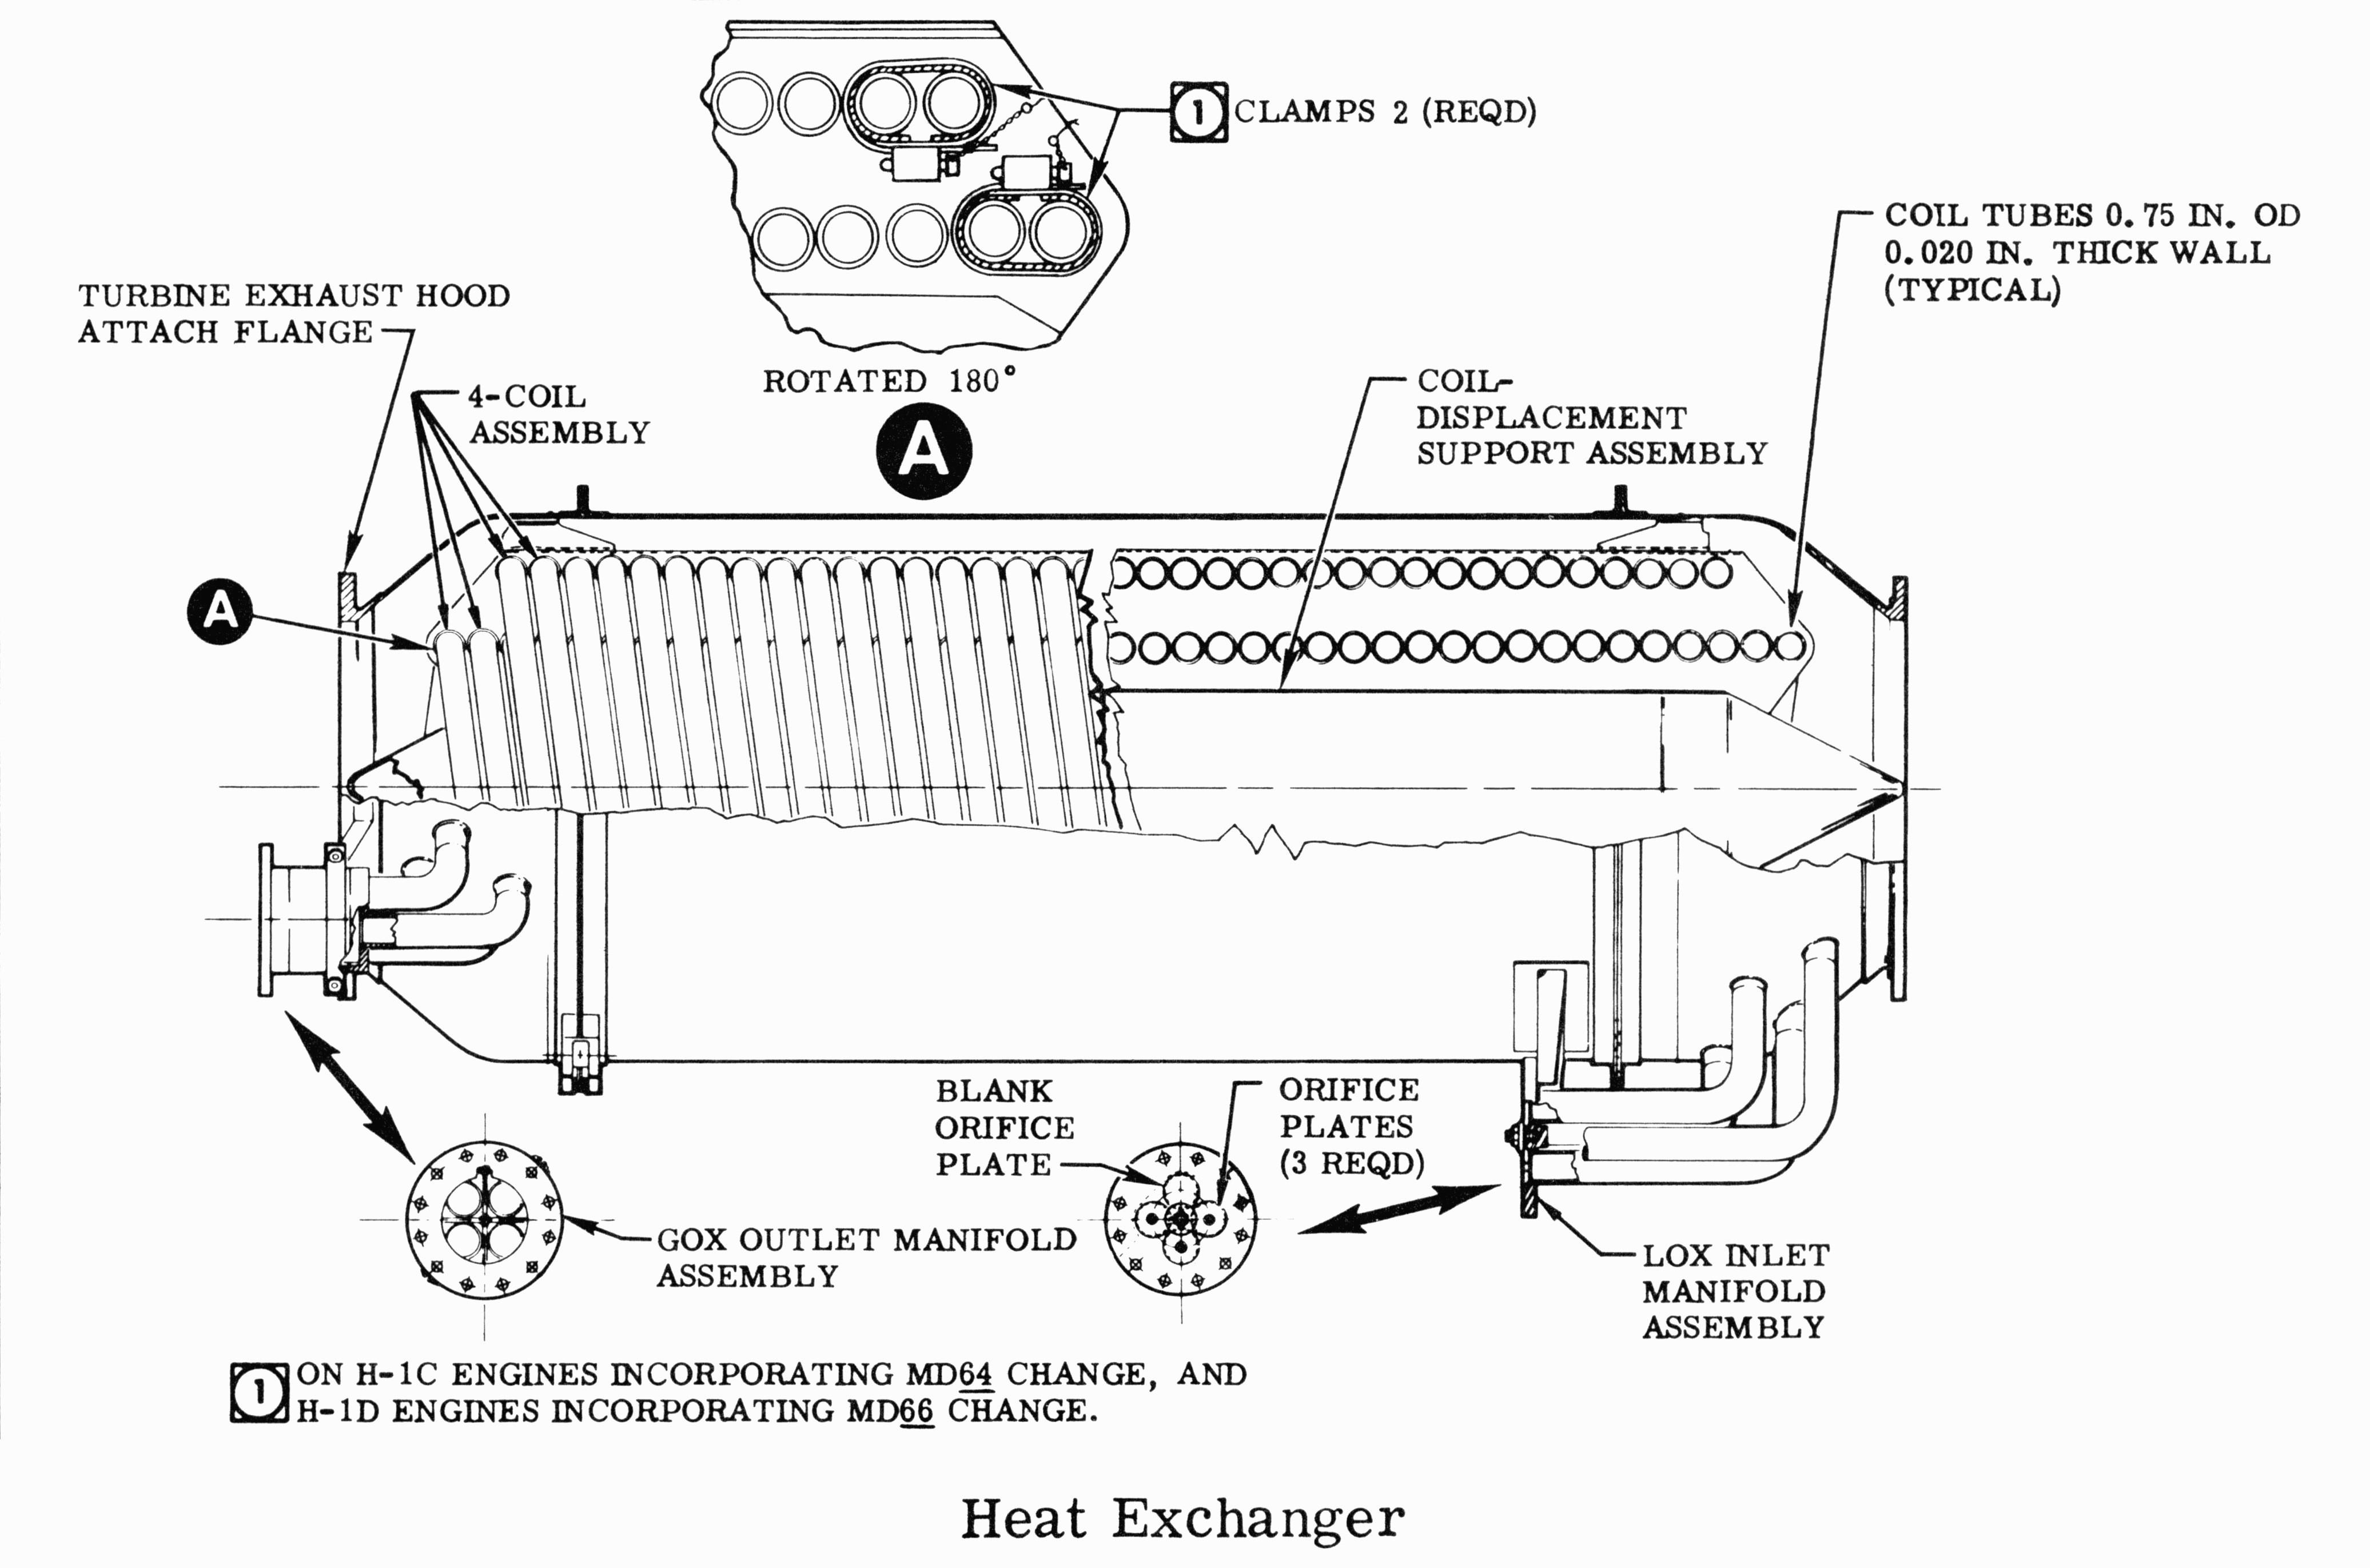 2005 Saturn Ion Engine Diagram Wrg 4669] 2003 Saturn Vue Wiring Harness Of 2005 Saturn Ion Engine Diagram